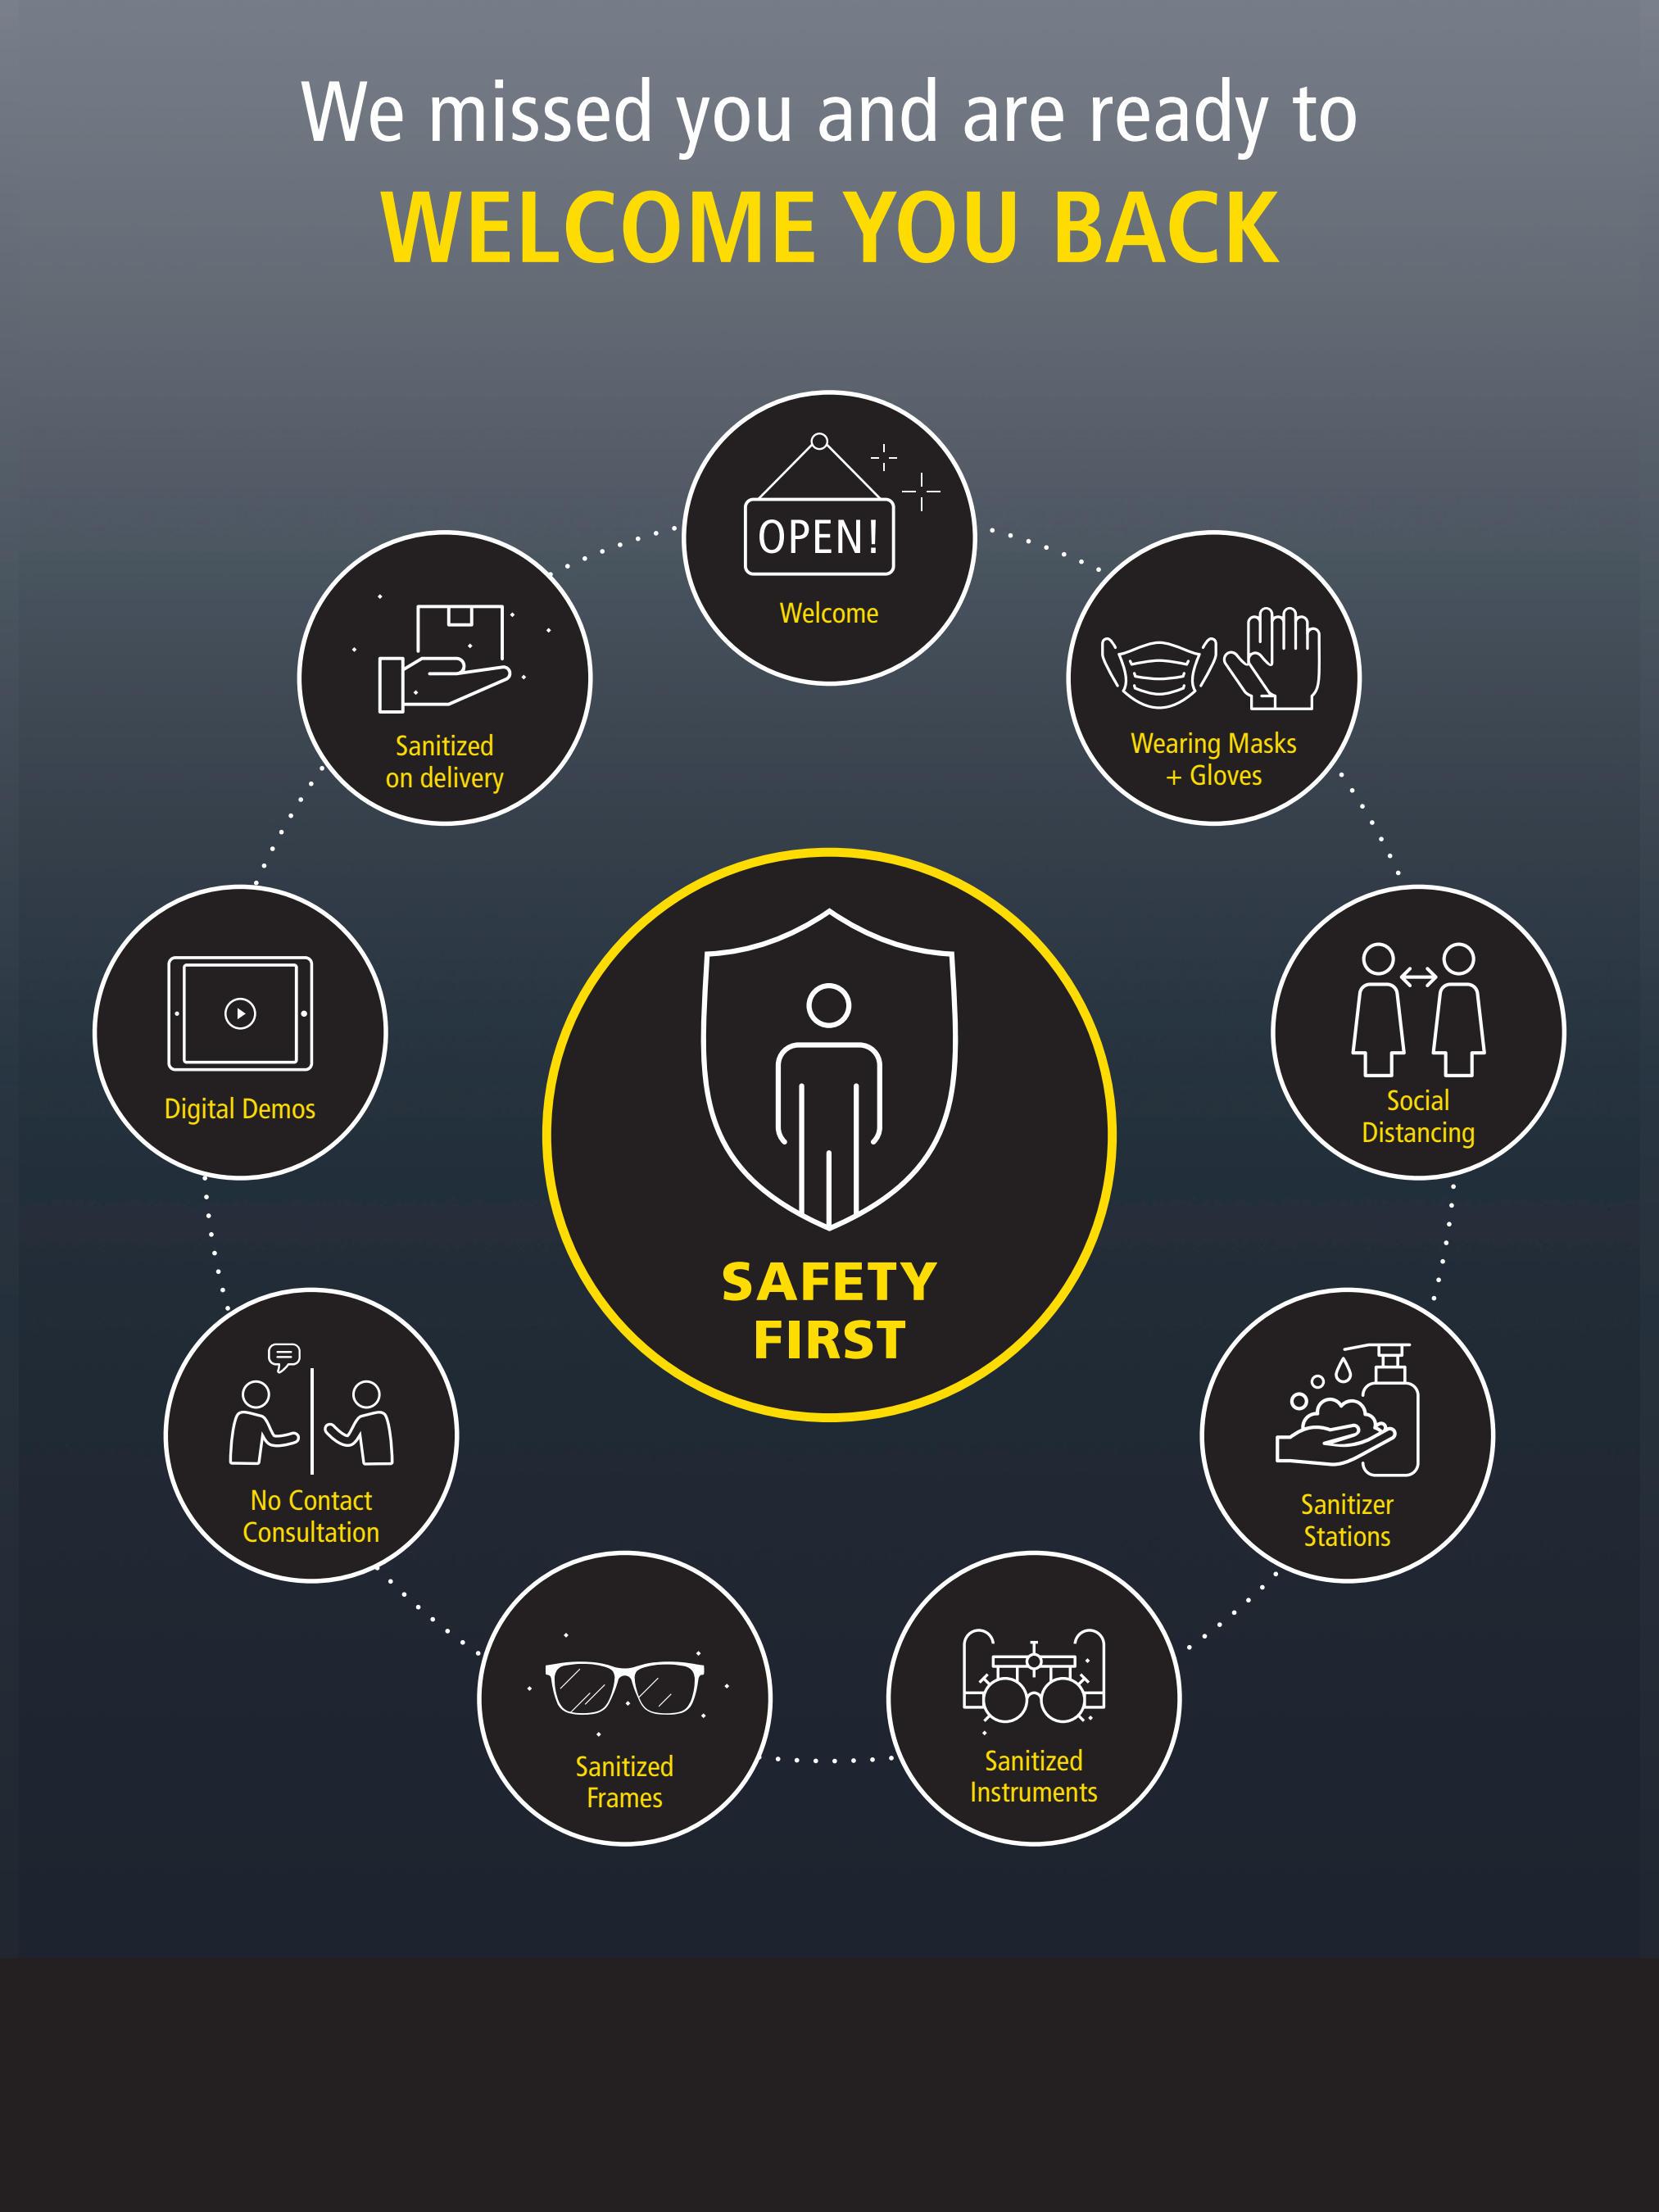 CODIV-19 Safety